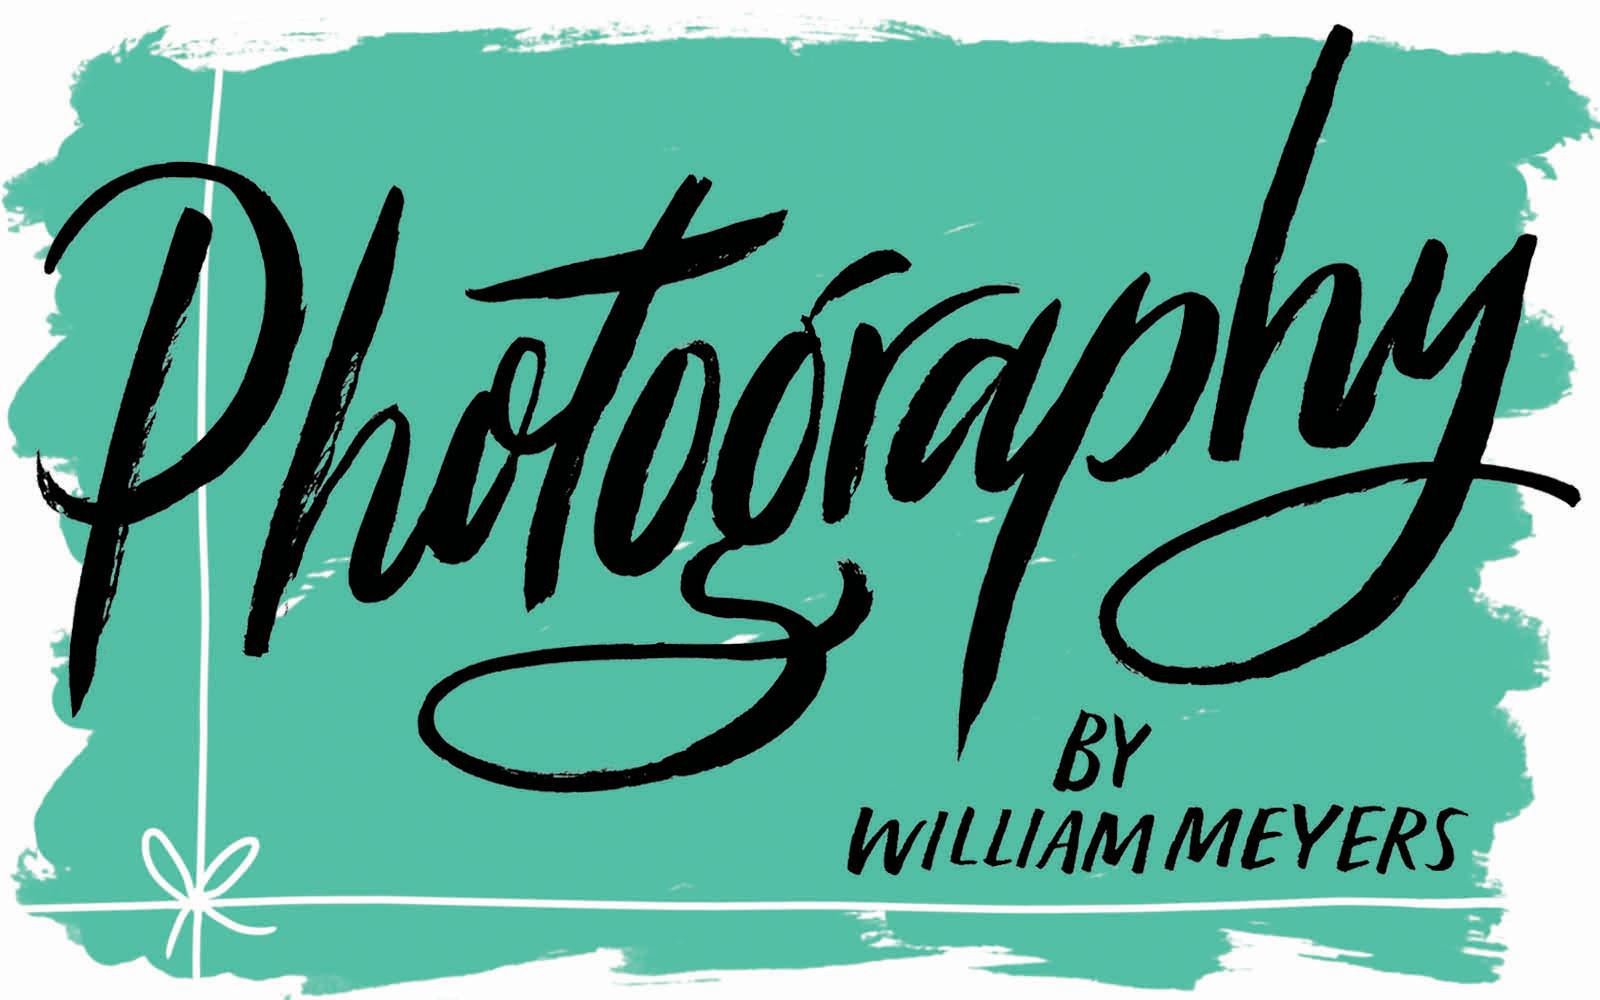 WSJ_Holiday_Photography.jpg